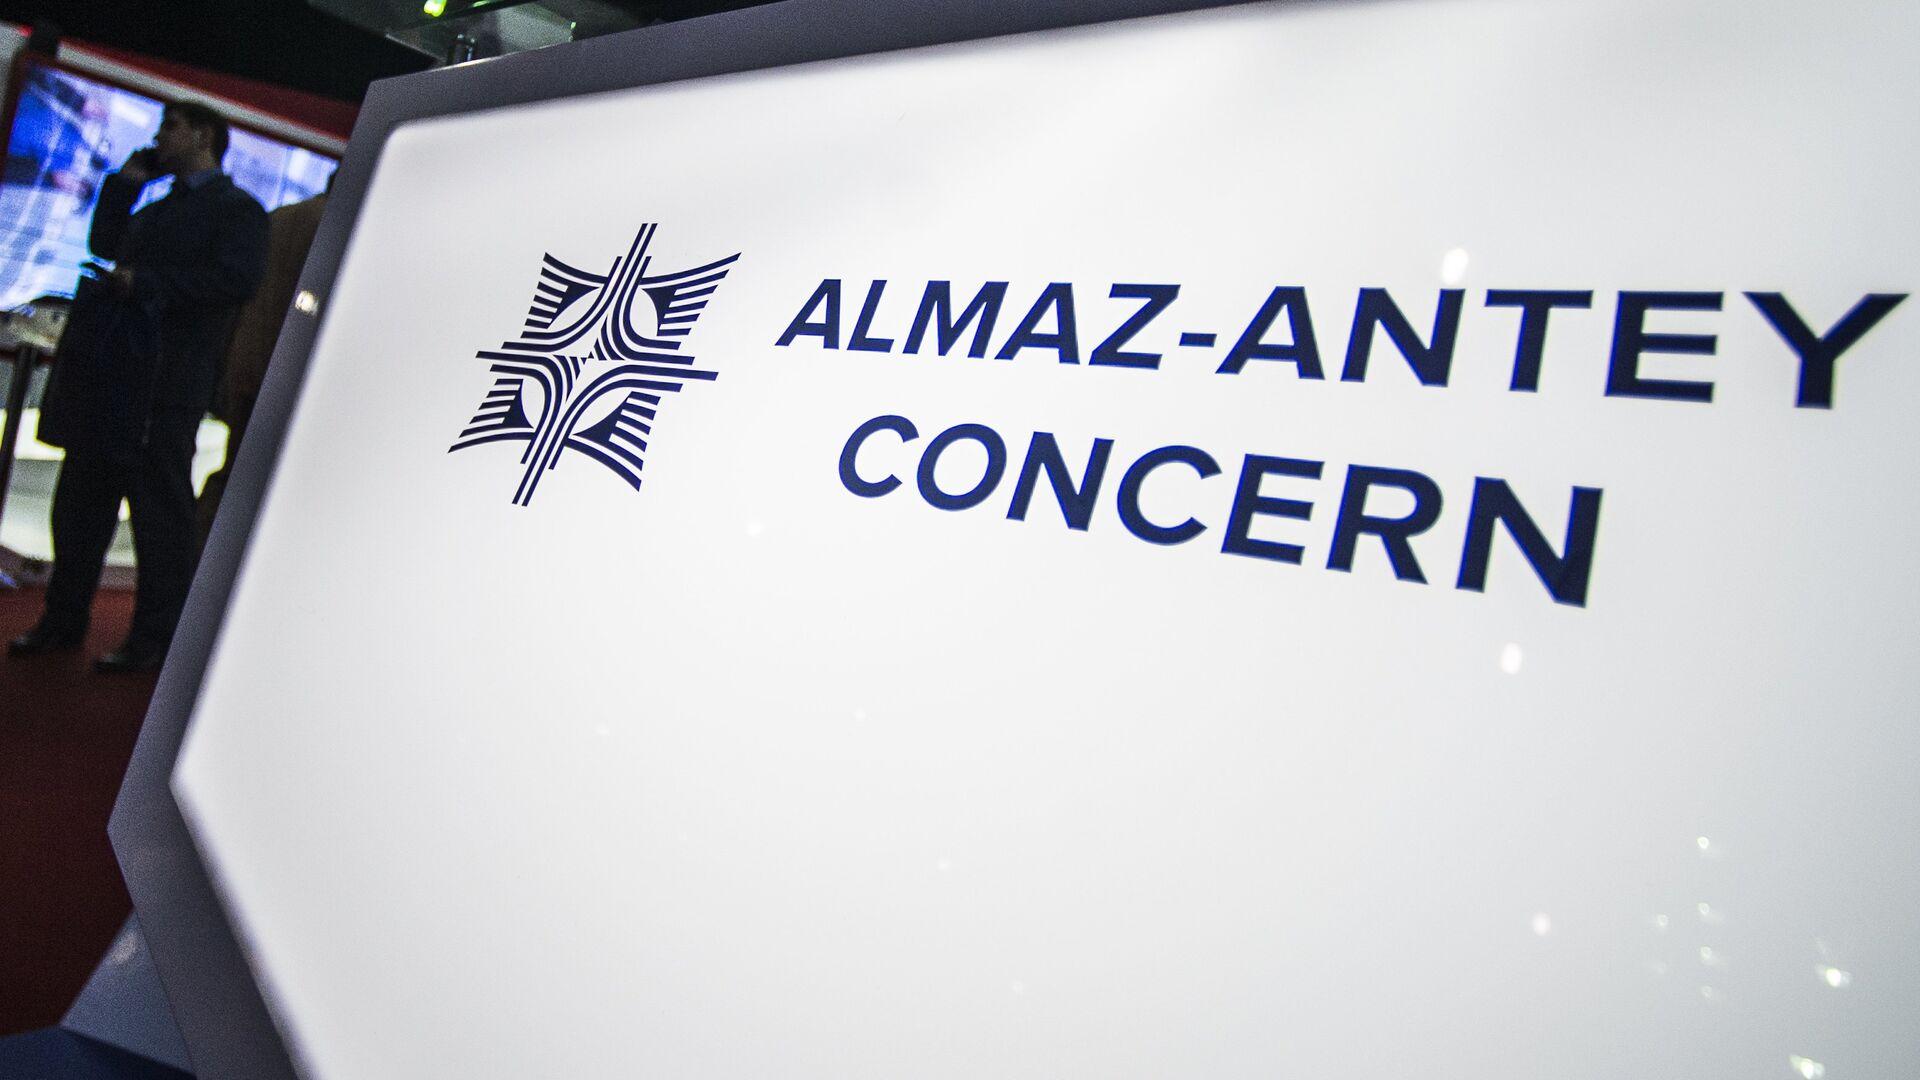 The Almaz-Antey stand at the 2015 Dubai Airshow international exhibition. (File) - Sputnik Italia, 1920, 21.06.2021